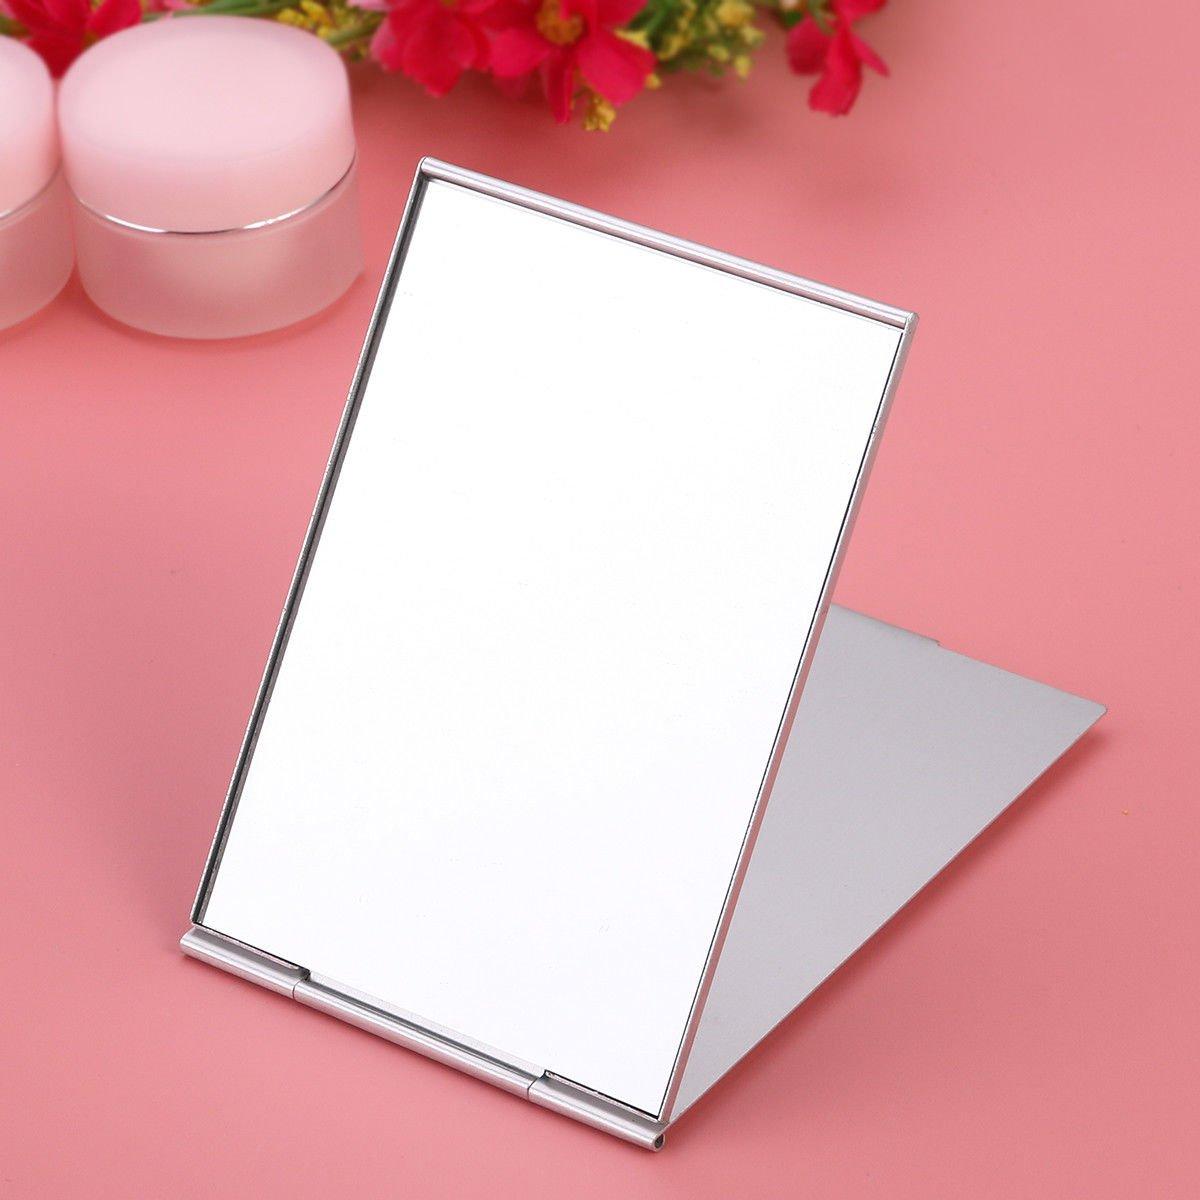 Mini Portable Vanity Mirror Single Side Travel Pocket Compact Mirror Silver